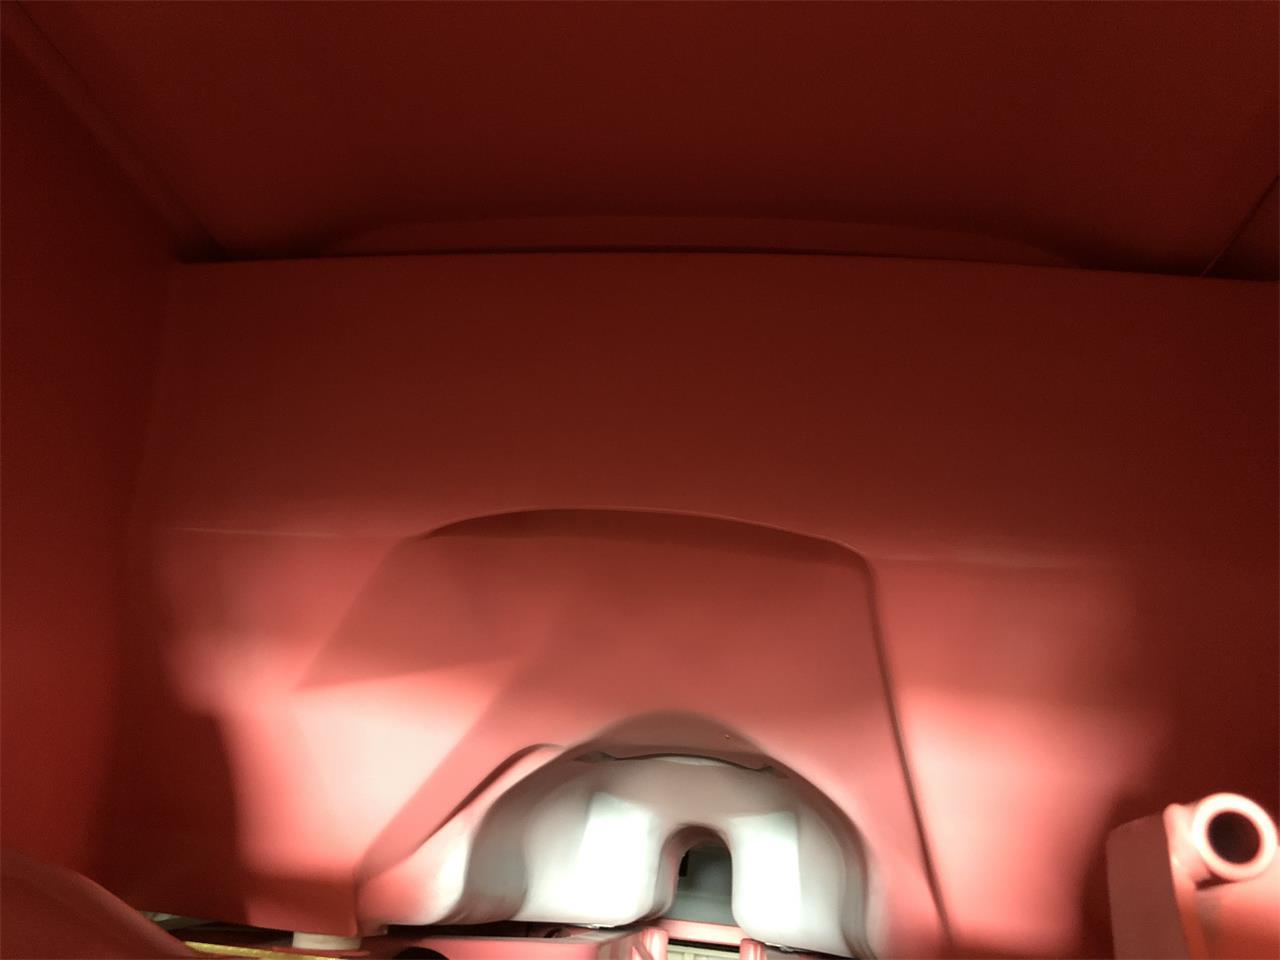 Large Picture of '62 Chevrolet Corvette located in Alabama - $95,000.00 - QA89